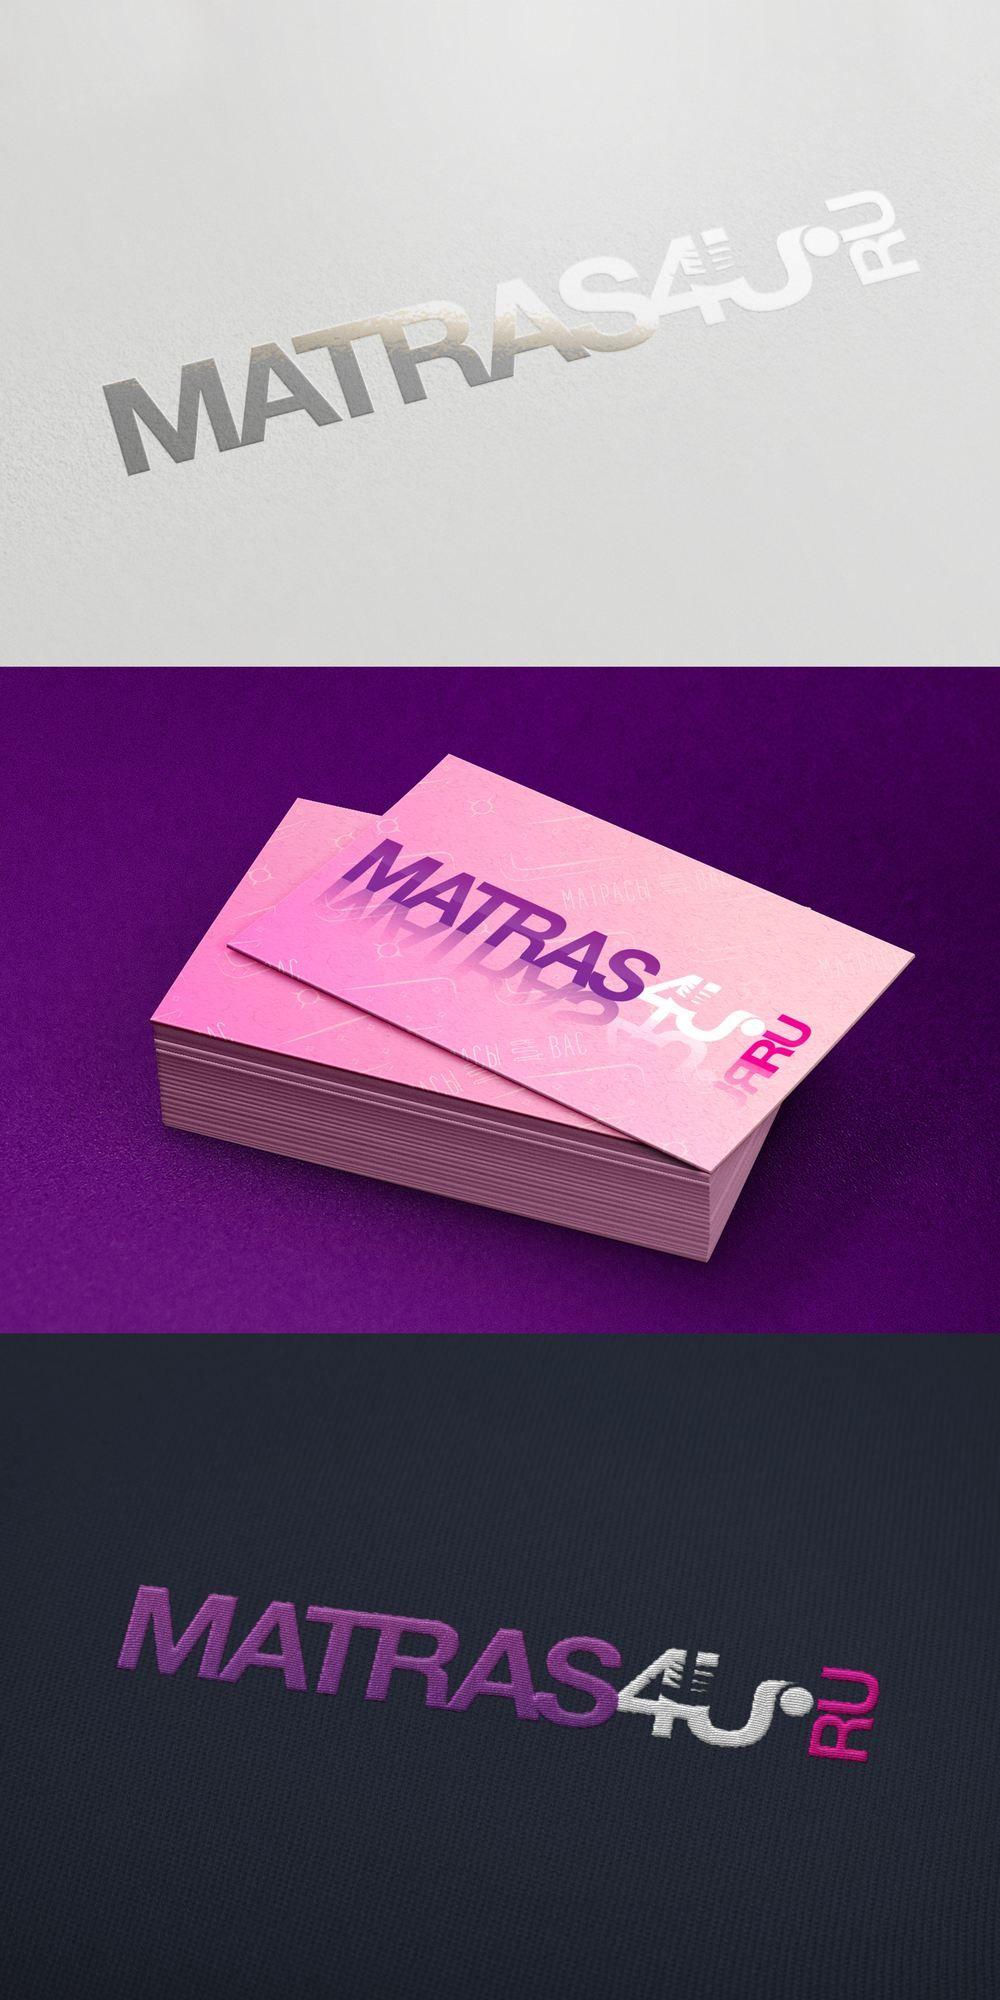 matras4u - дизайнер chumarkov